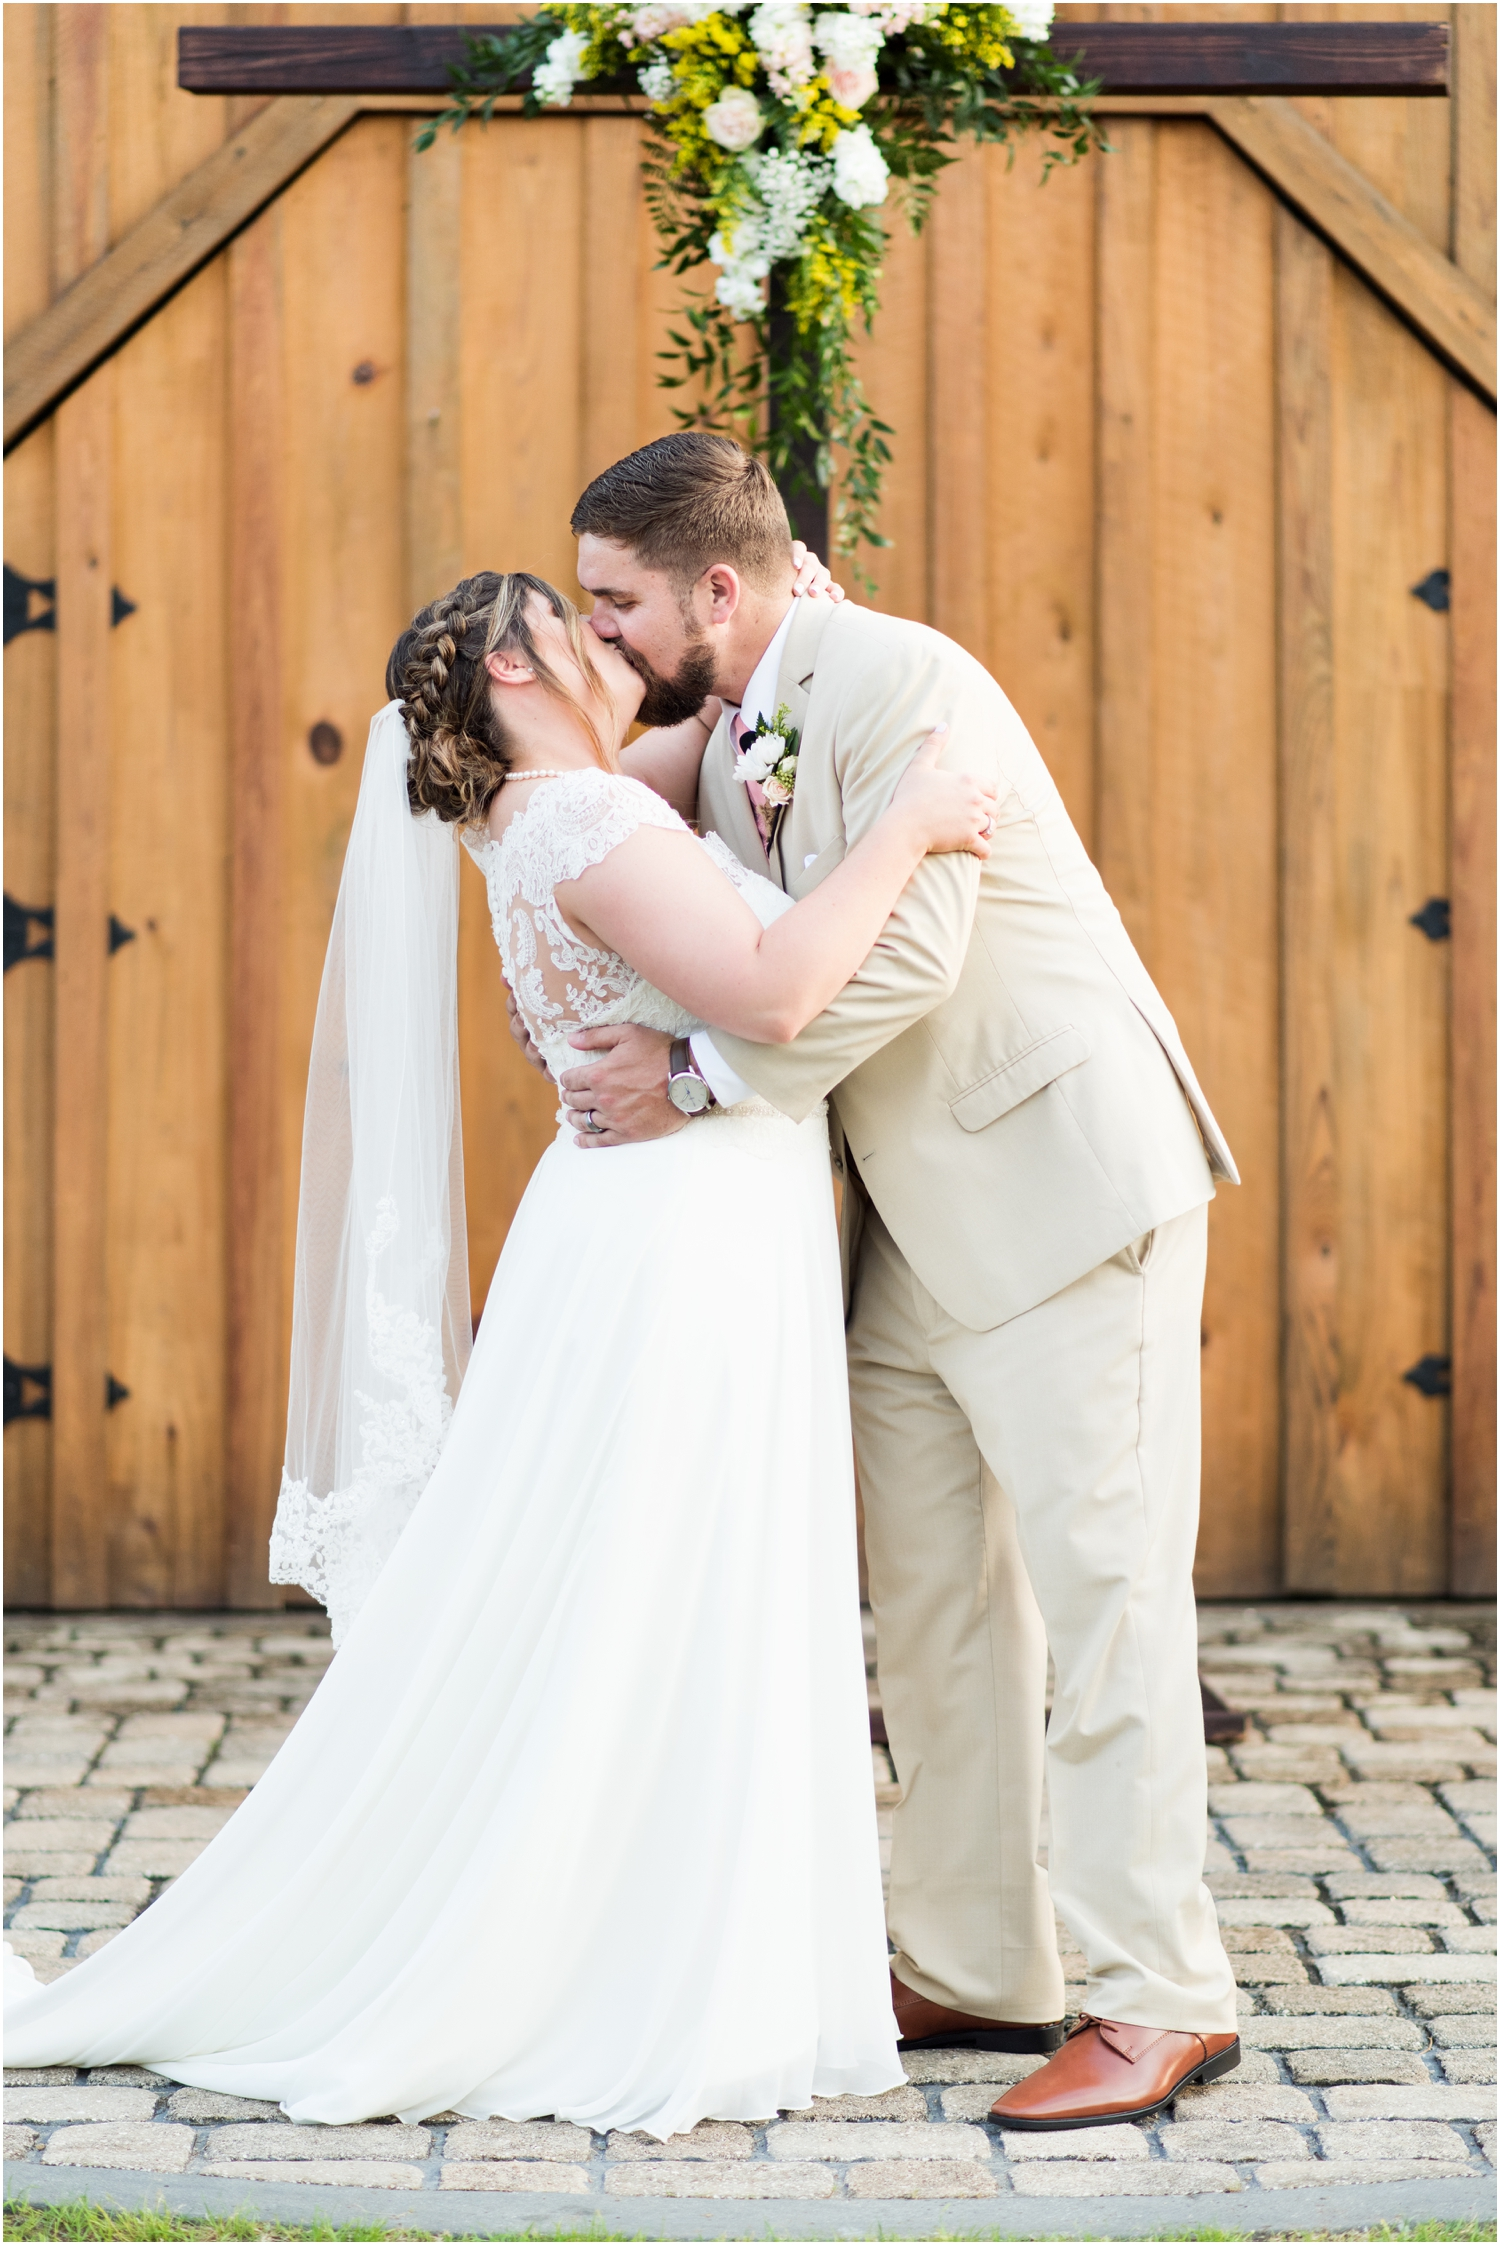 Sowell Farms Milton Florida Rustic Woodsy Barn Wedding Photographer ceremony